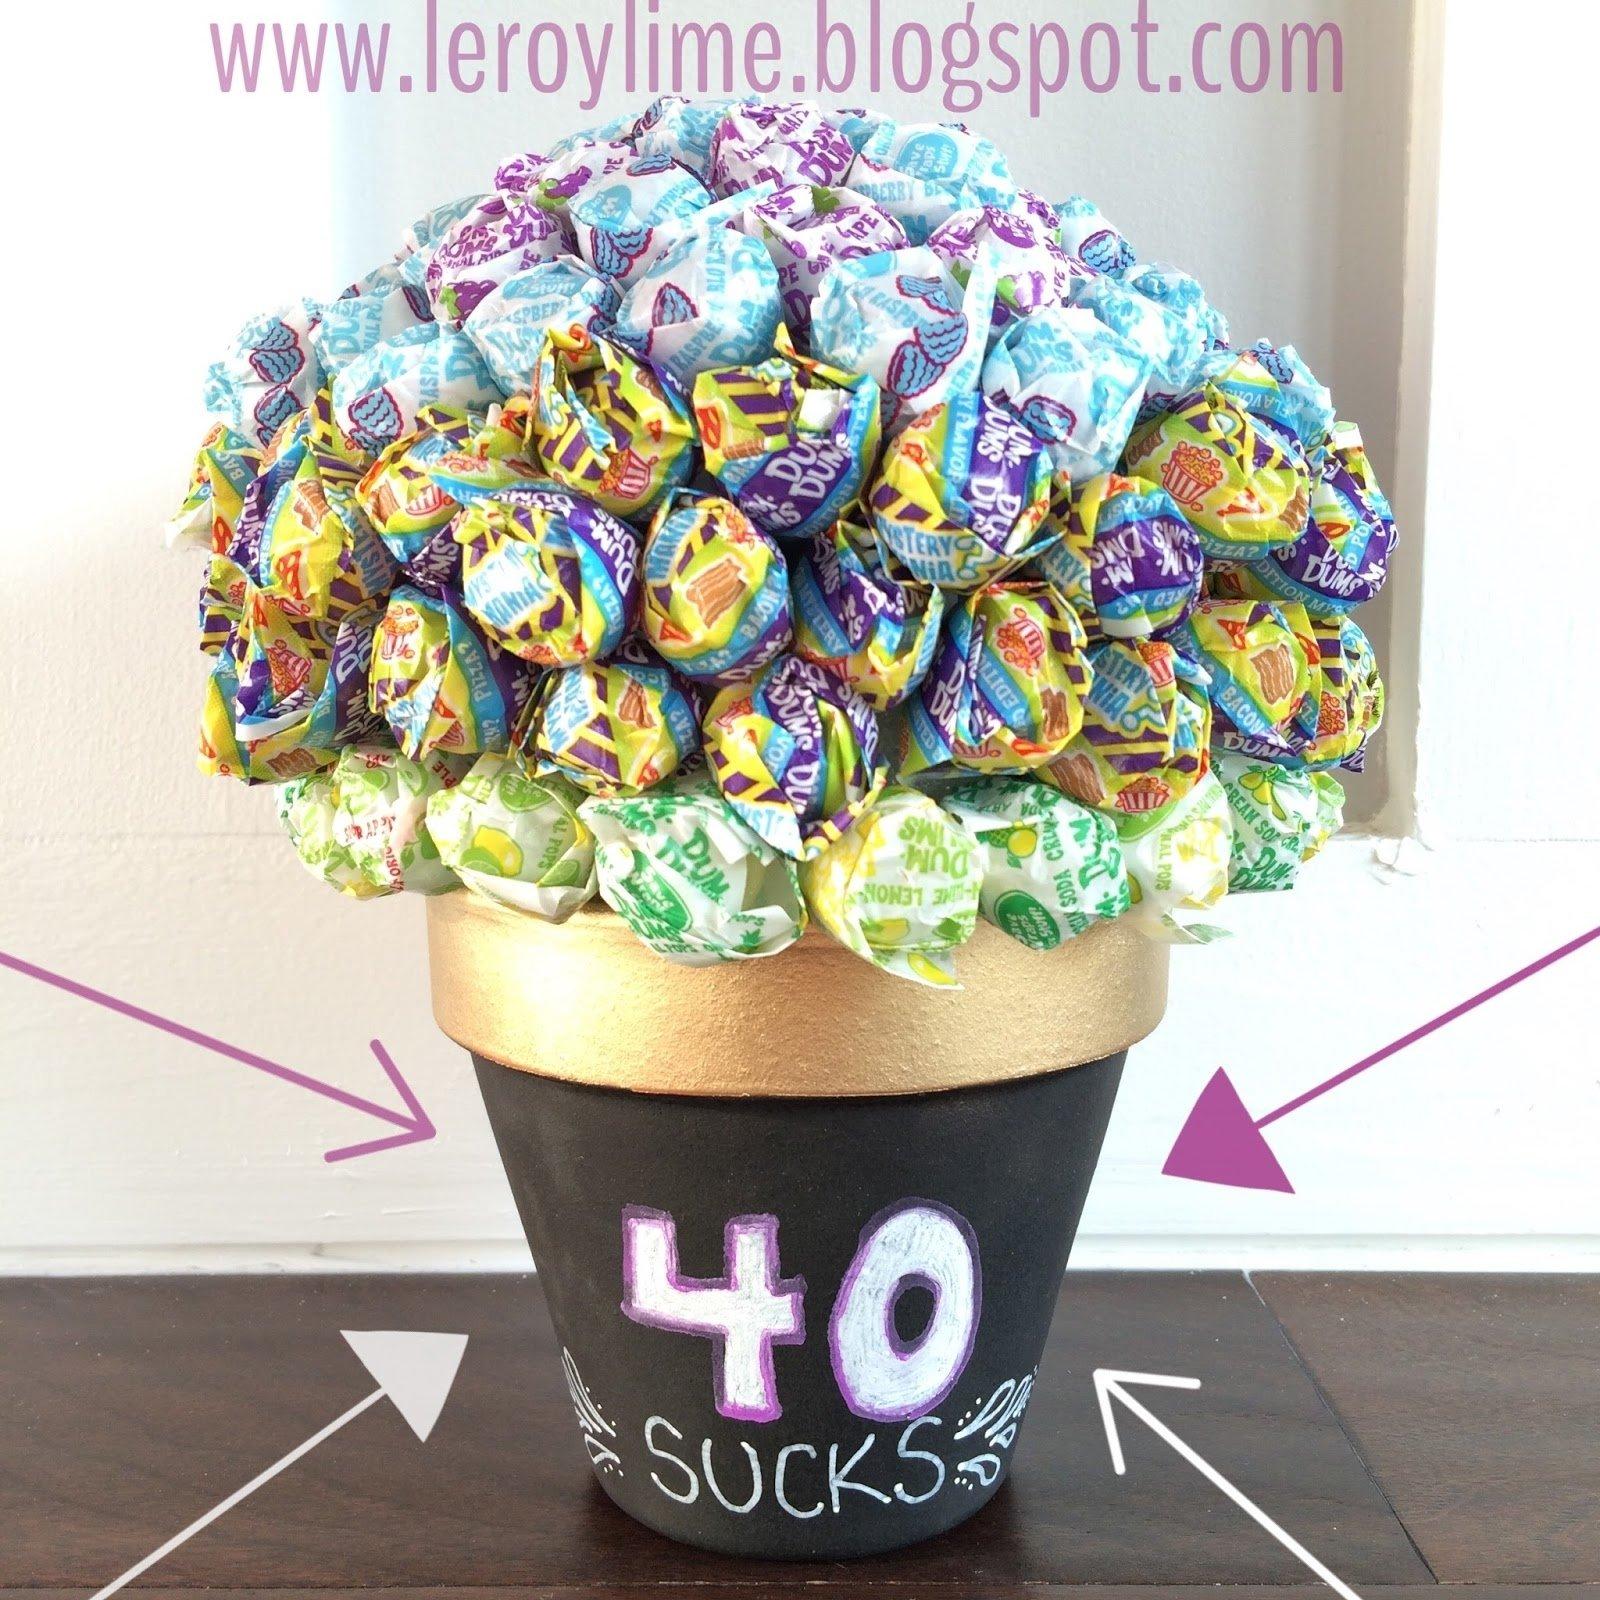 10 Trendy 40Th Birthday Gift Ideas Her leroylime 40th birthday gift idea 2 2020